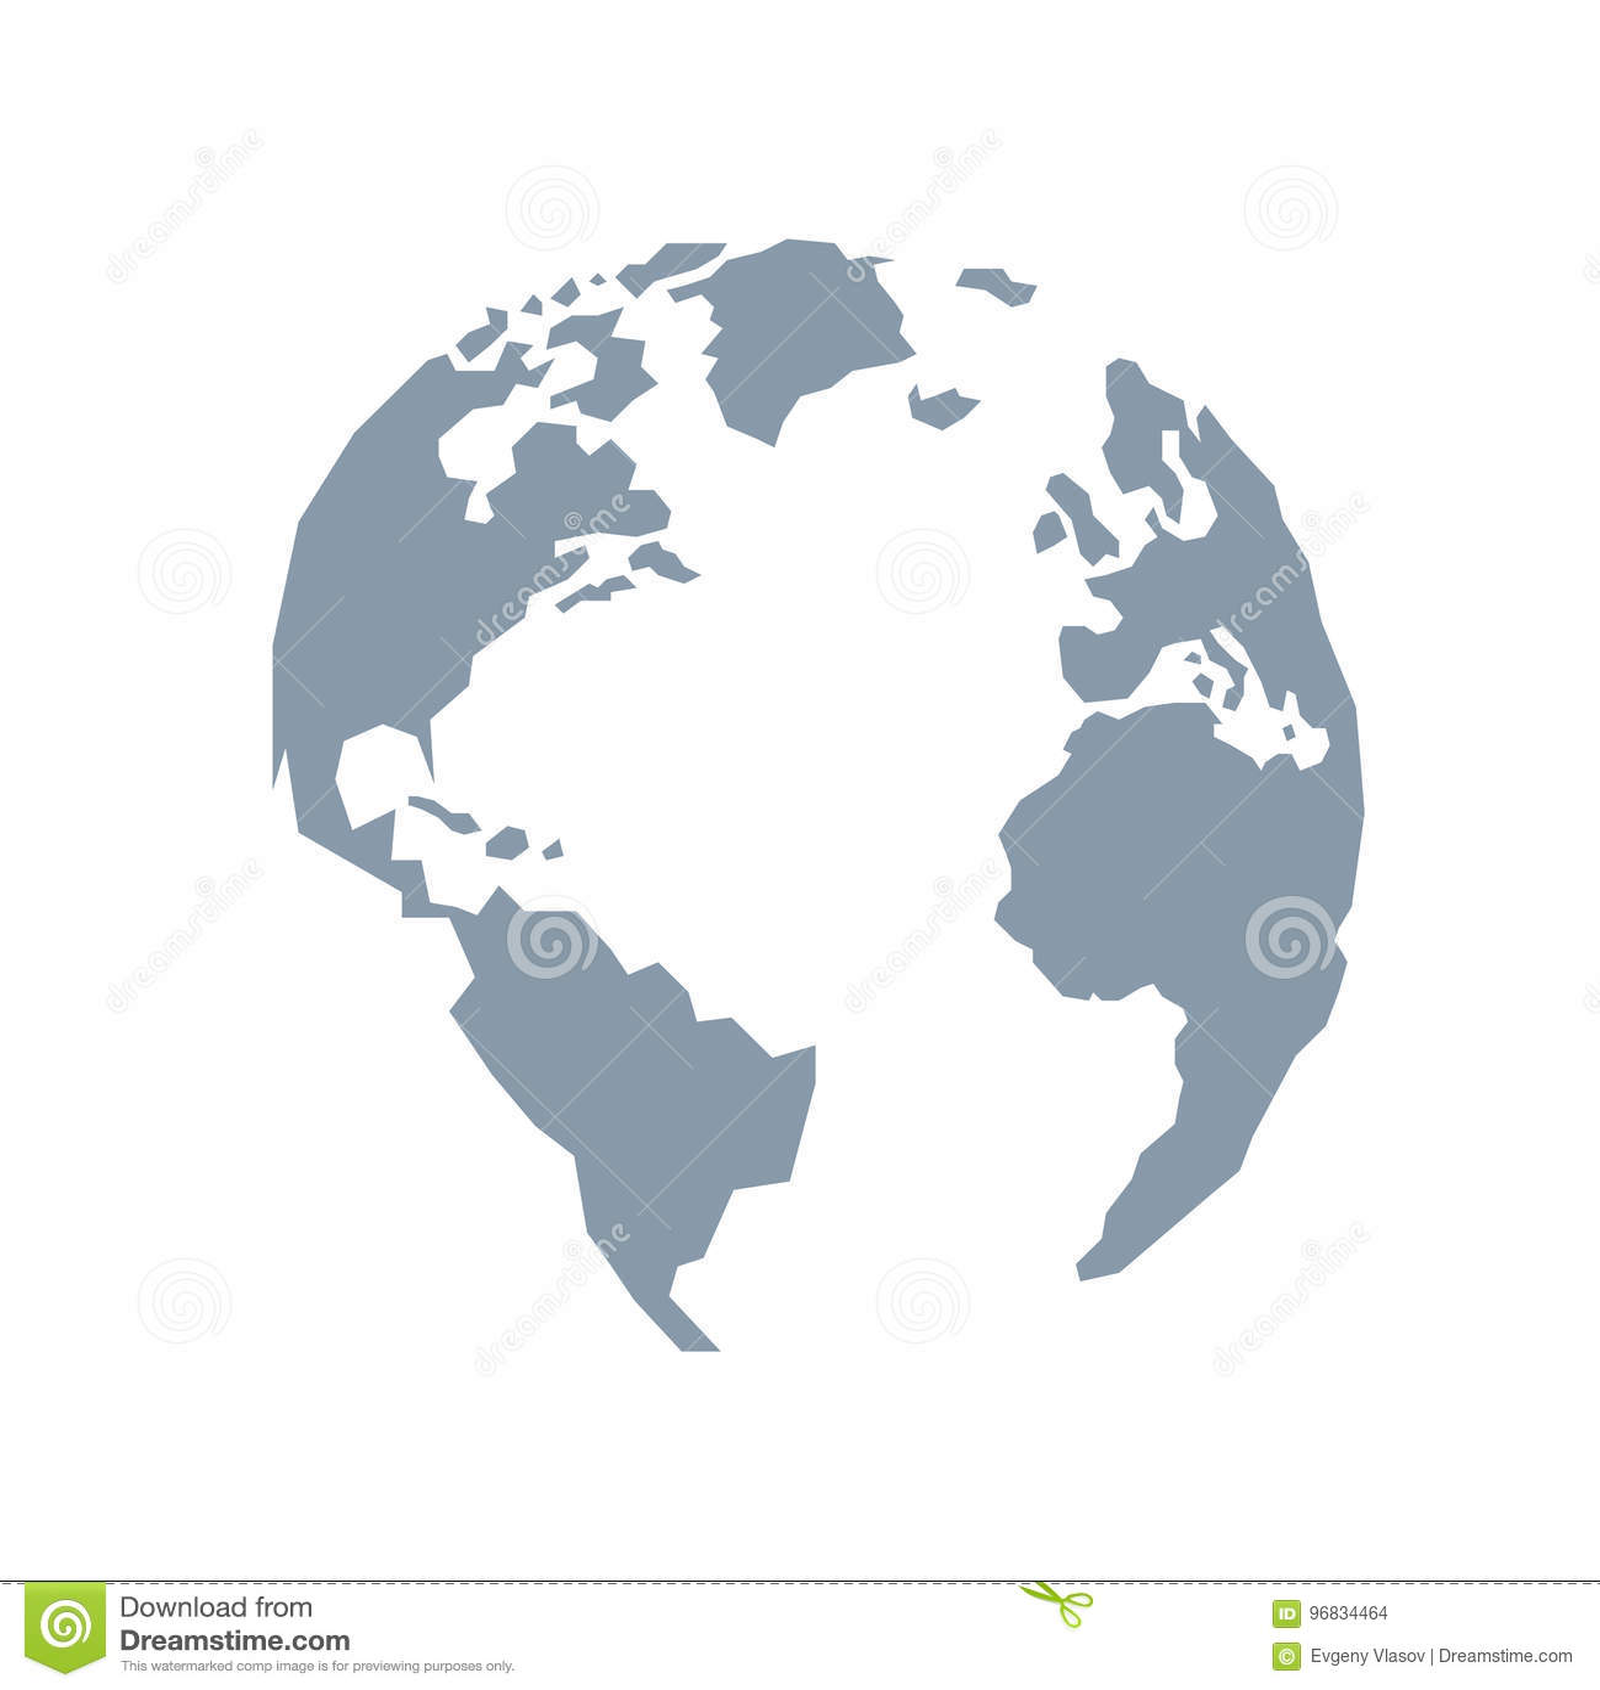 Lowpoly globe. America, Europe, Atlantic Ocean. Blue grey.